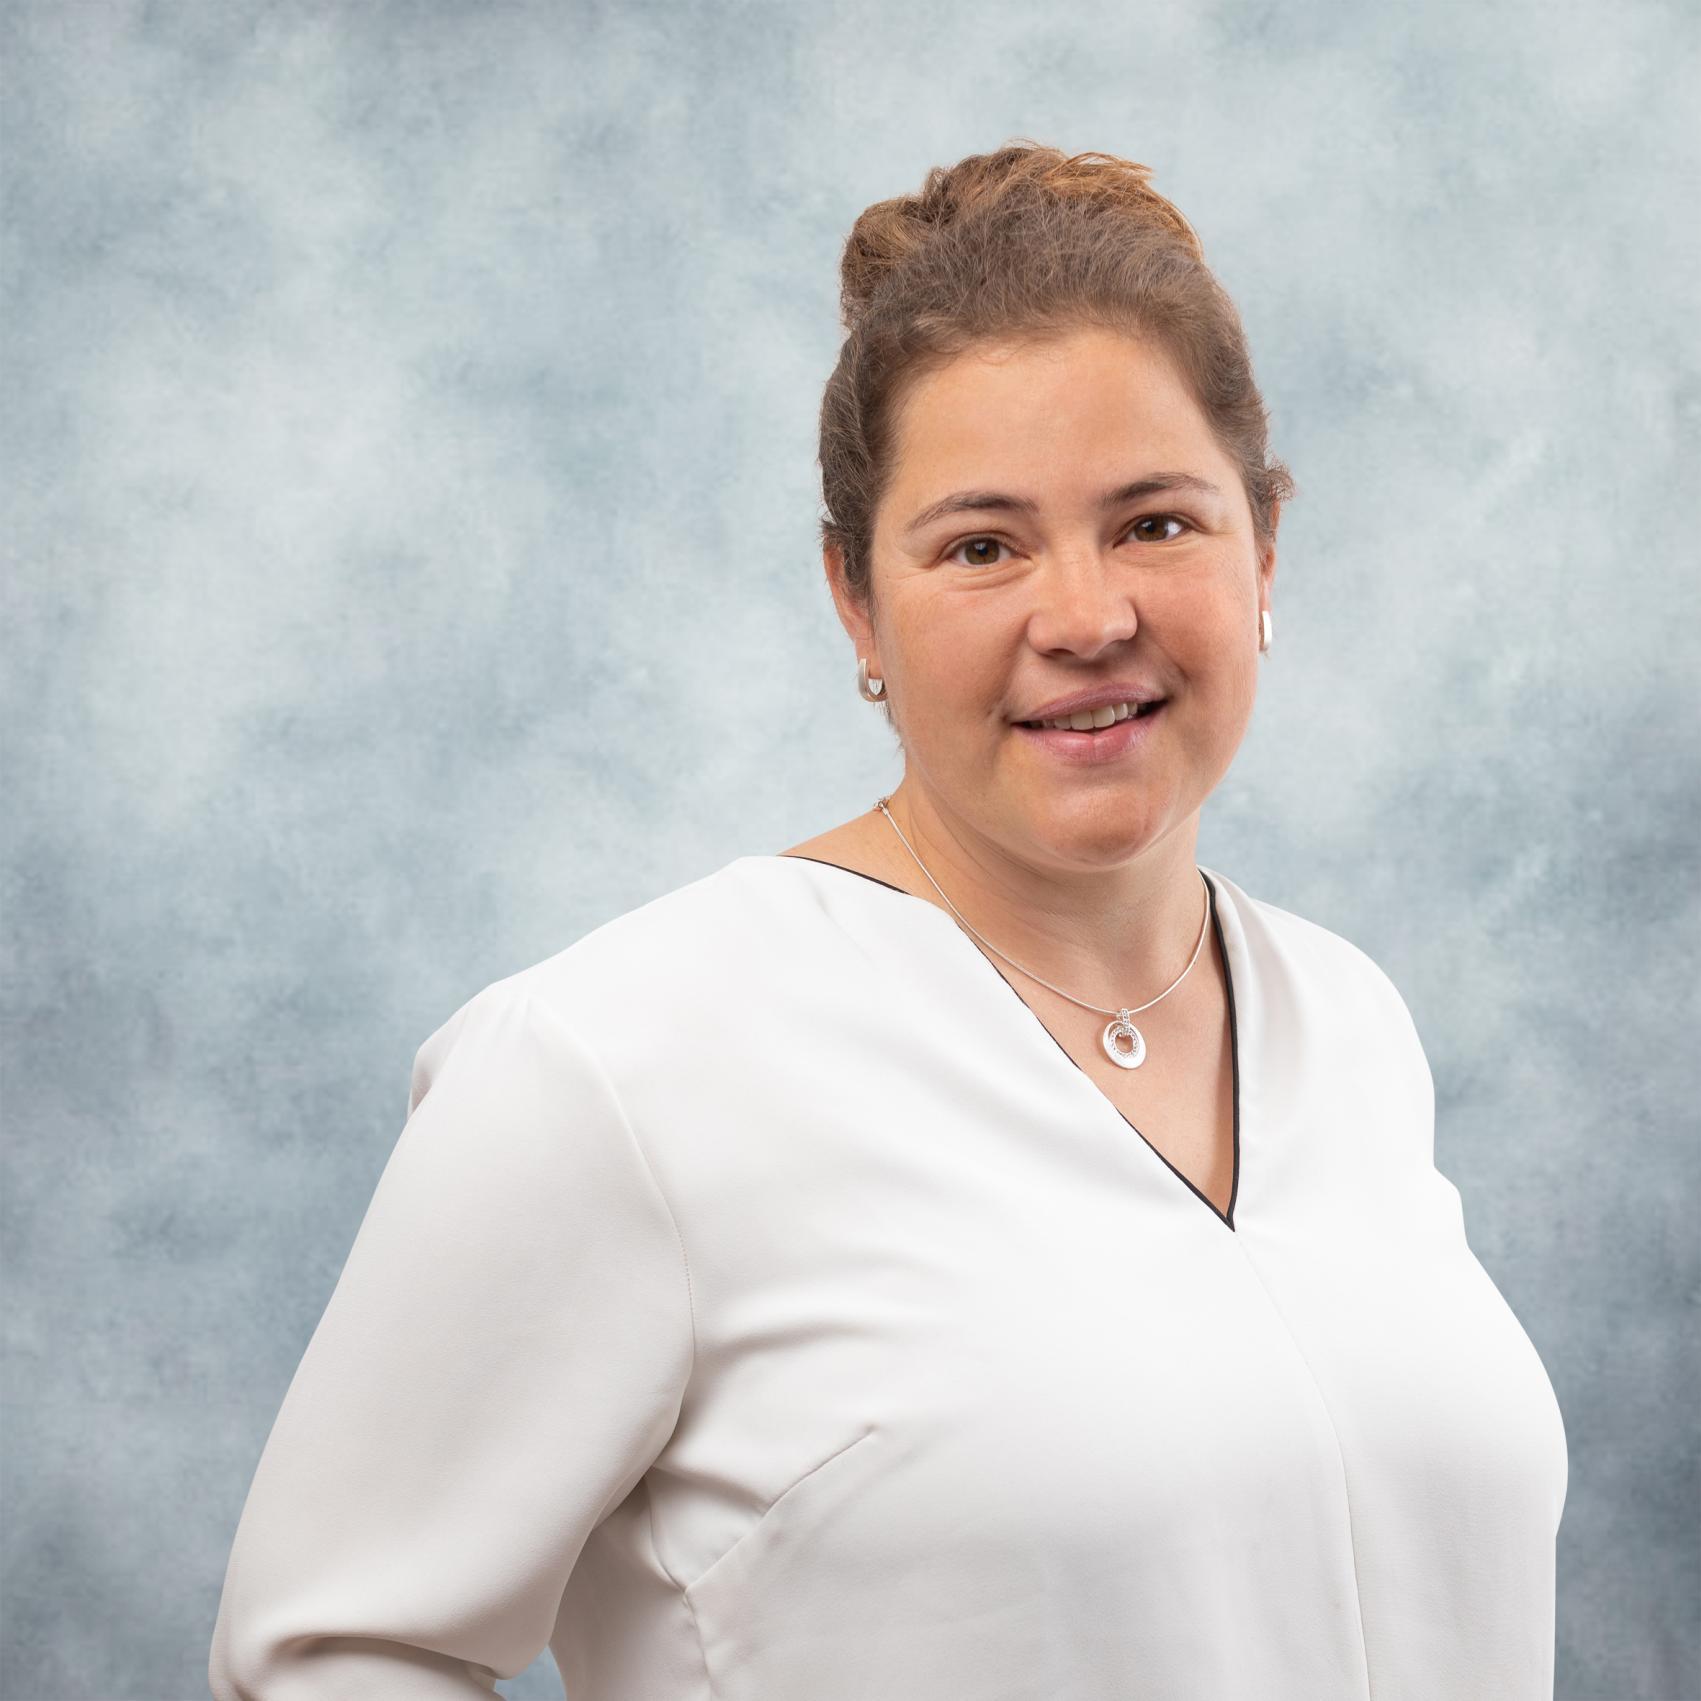 Dr. med. Eva Dunau - Strahlentherapie Baden-Baden